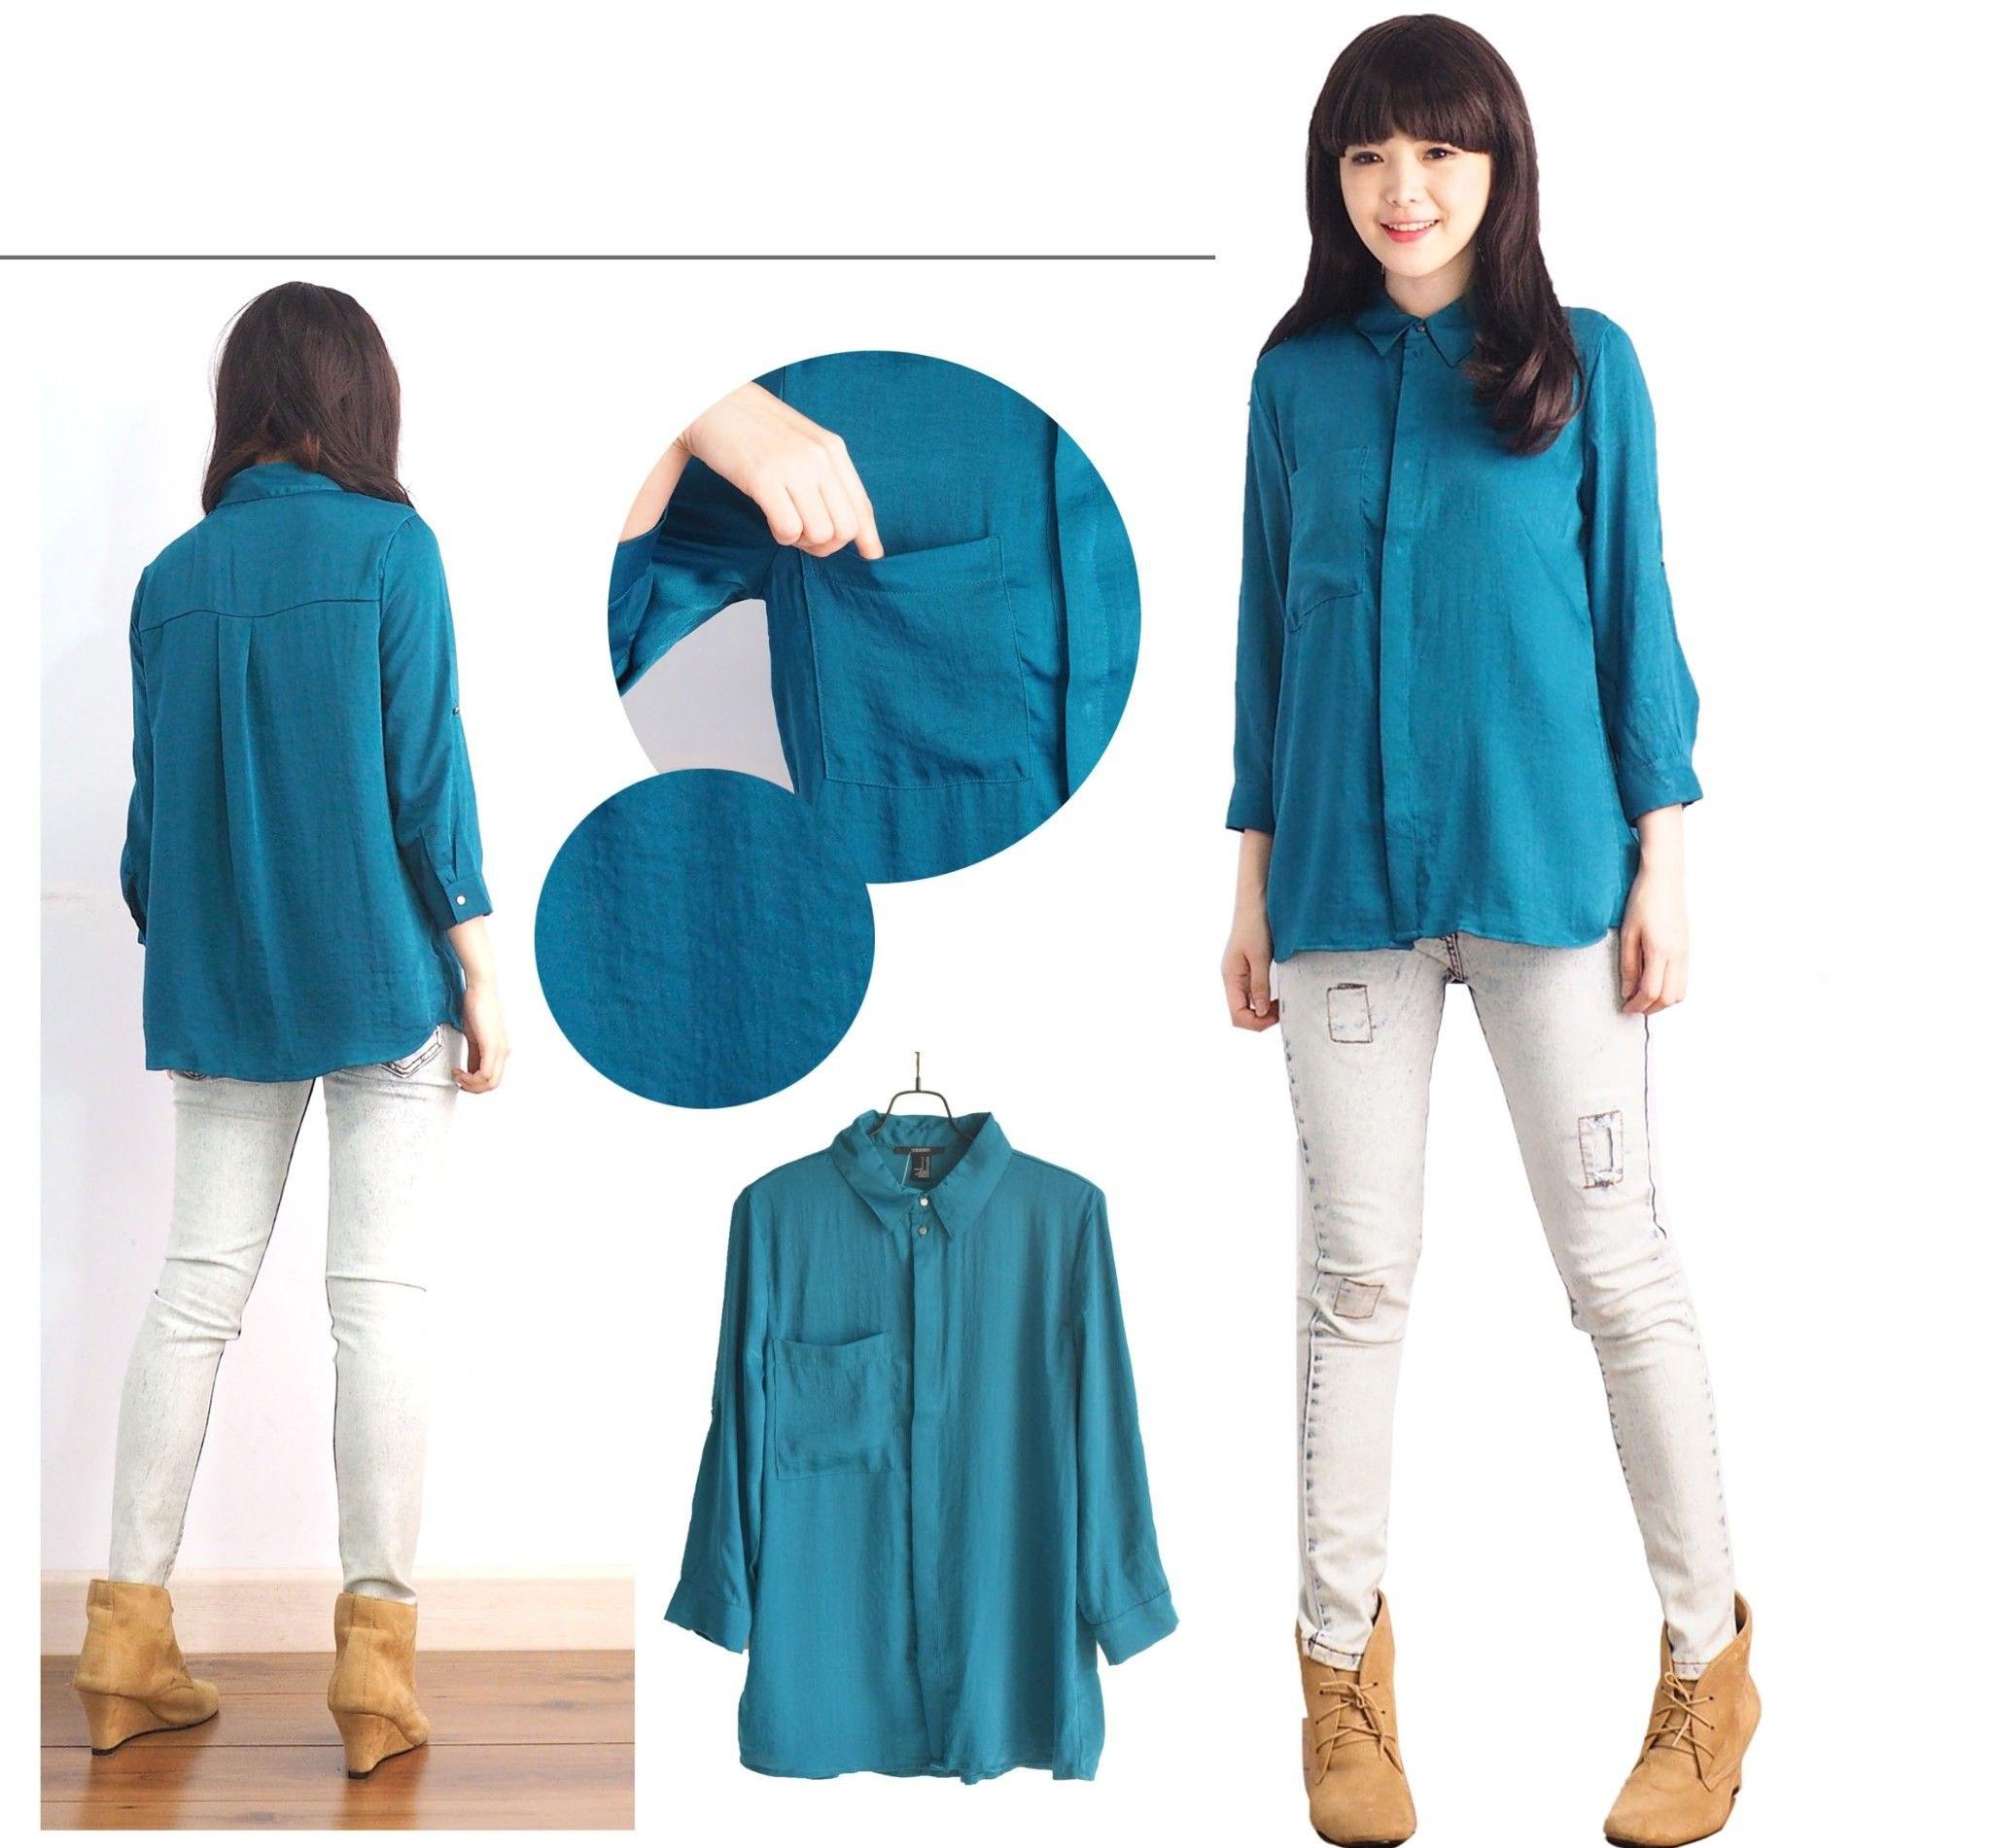 Bentuk Baju Lebaran Wanita Terbaru 9ddf Blouse Muslim Model Pakaian Wanita Terbaru Pakaian Bayi